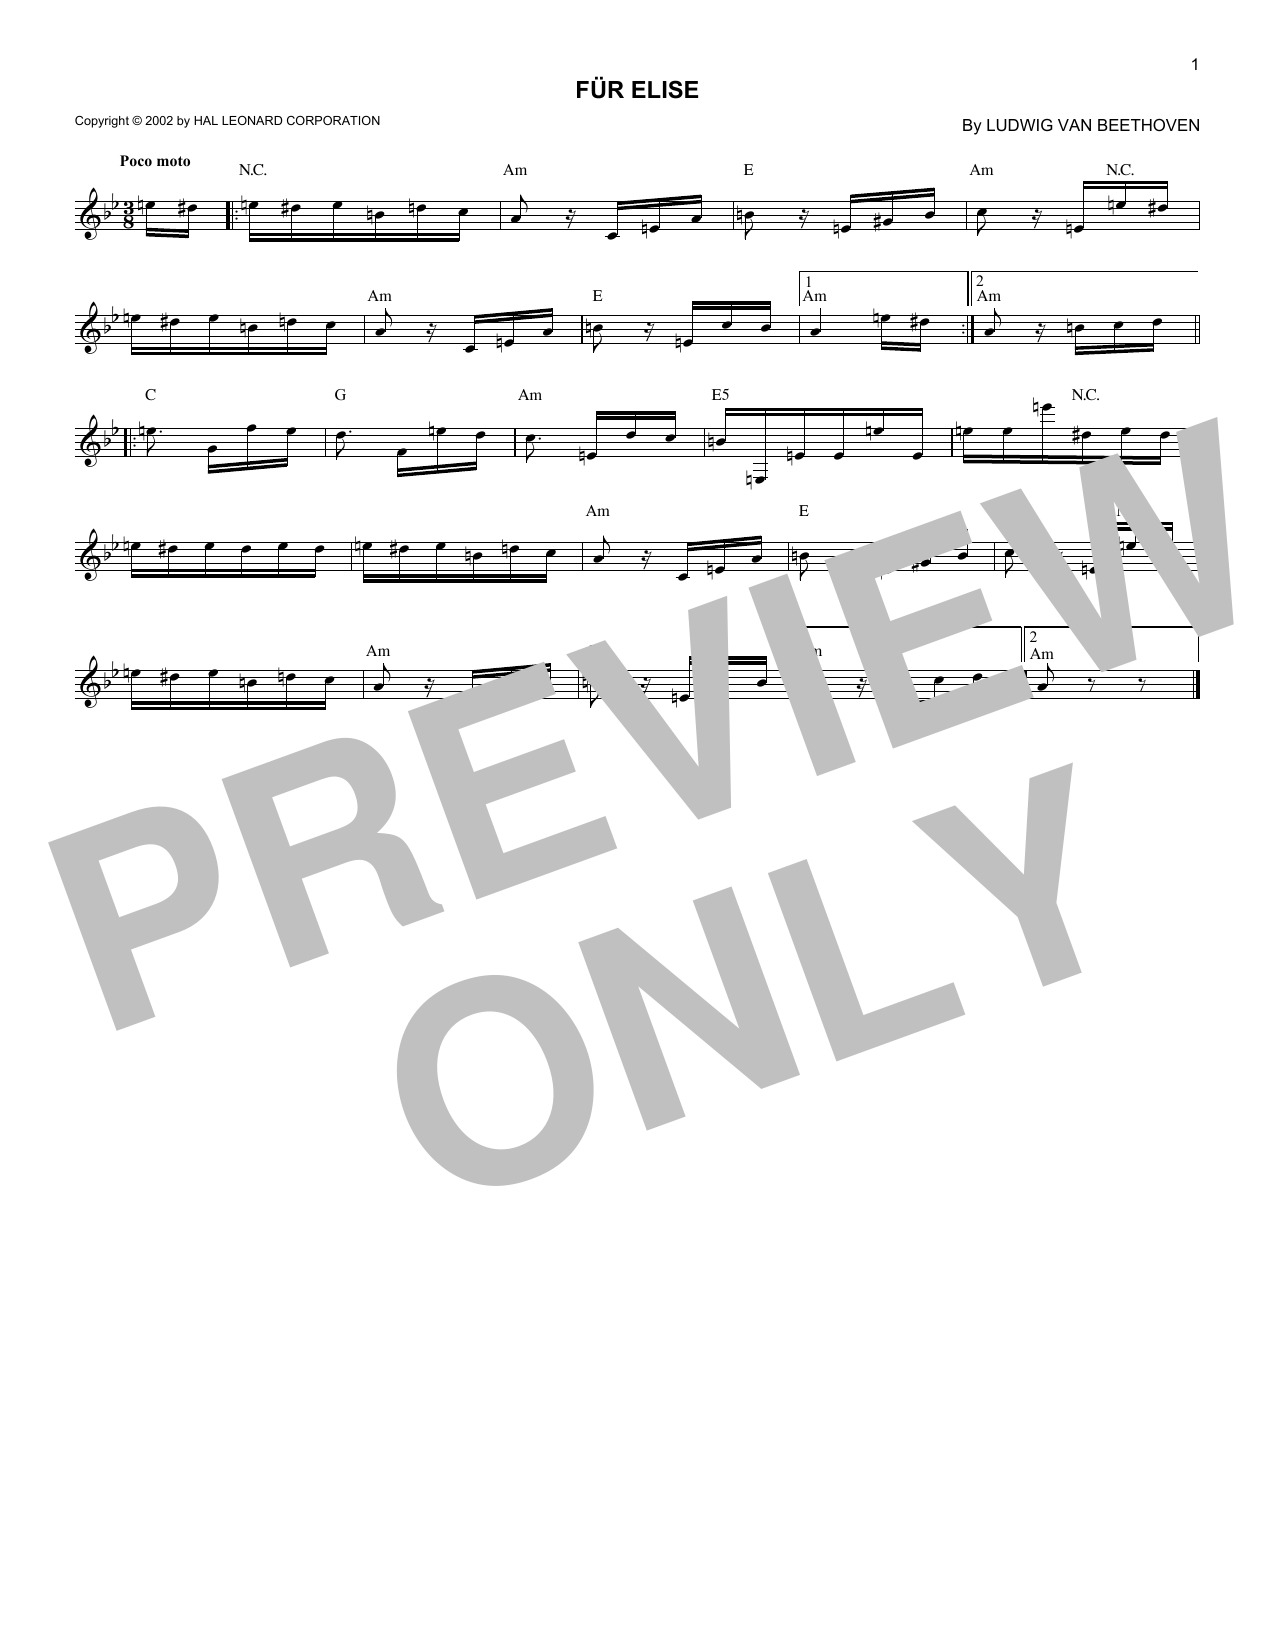 Ludwig van Beethoven Fur Elise sheet music notes and chords. Download Printable PDF.